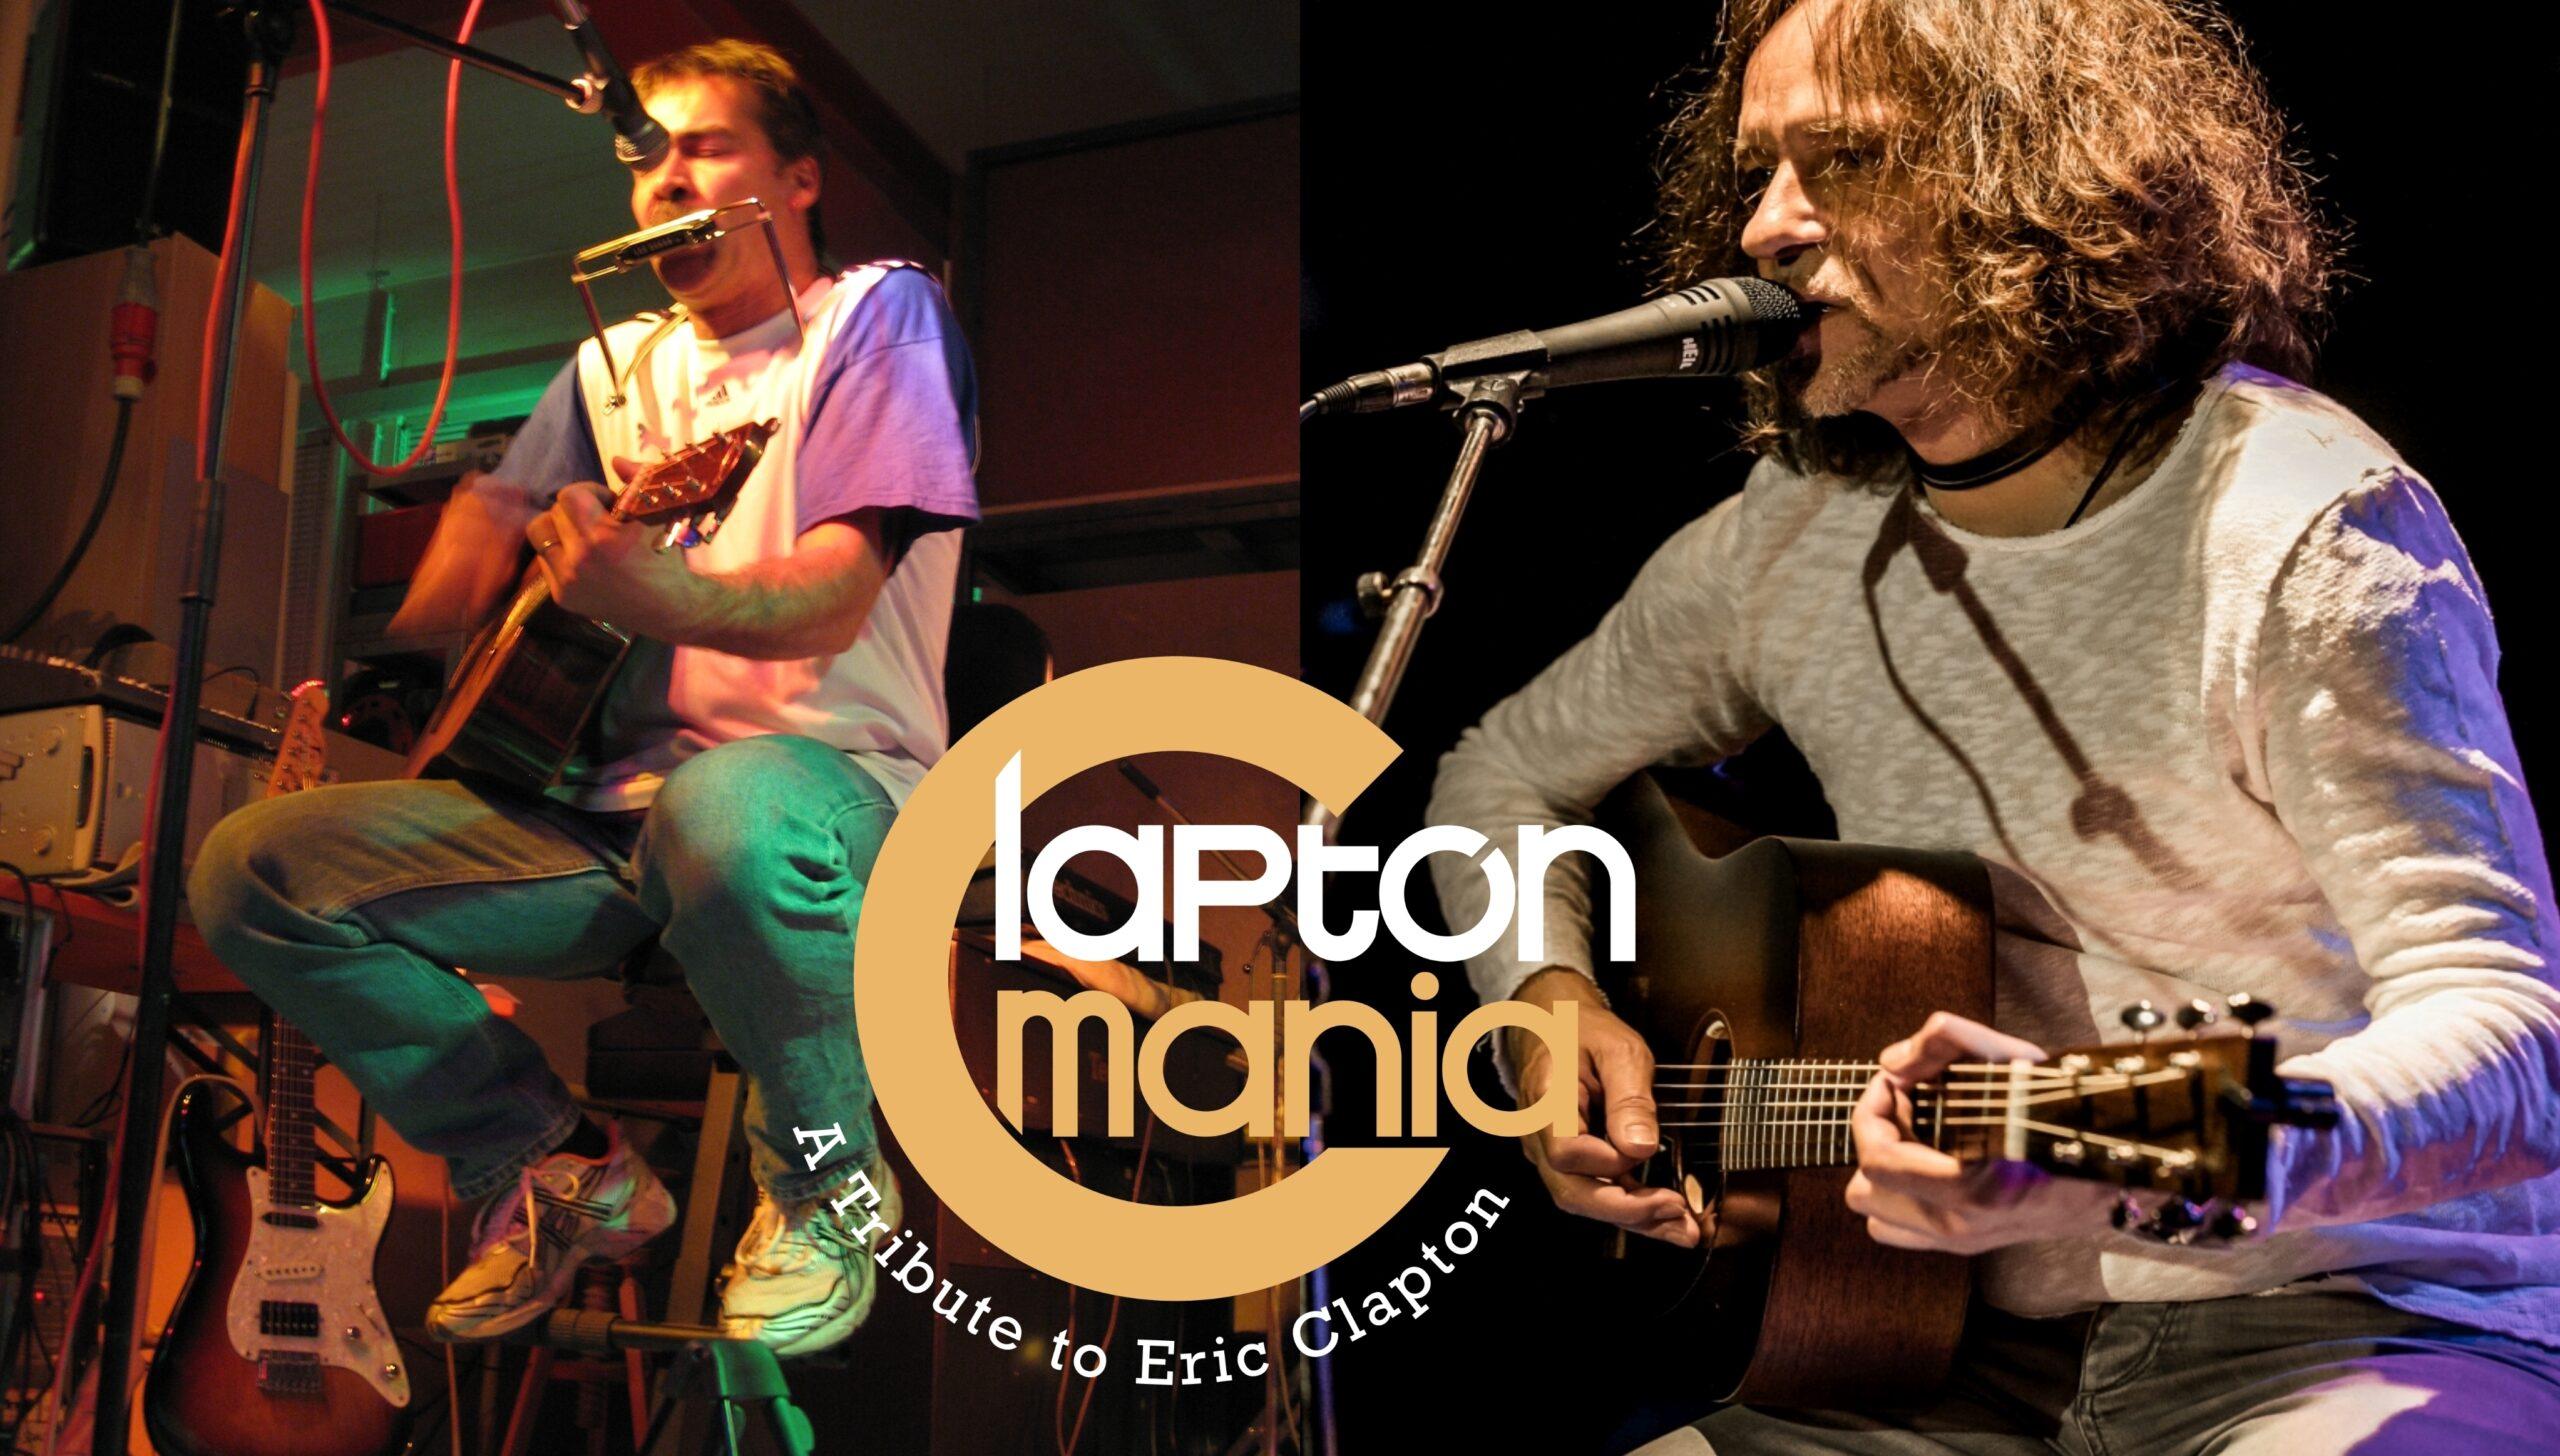 Claptonmania unplugged